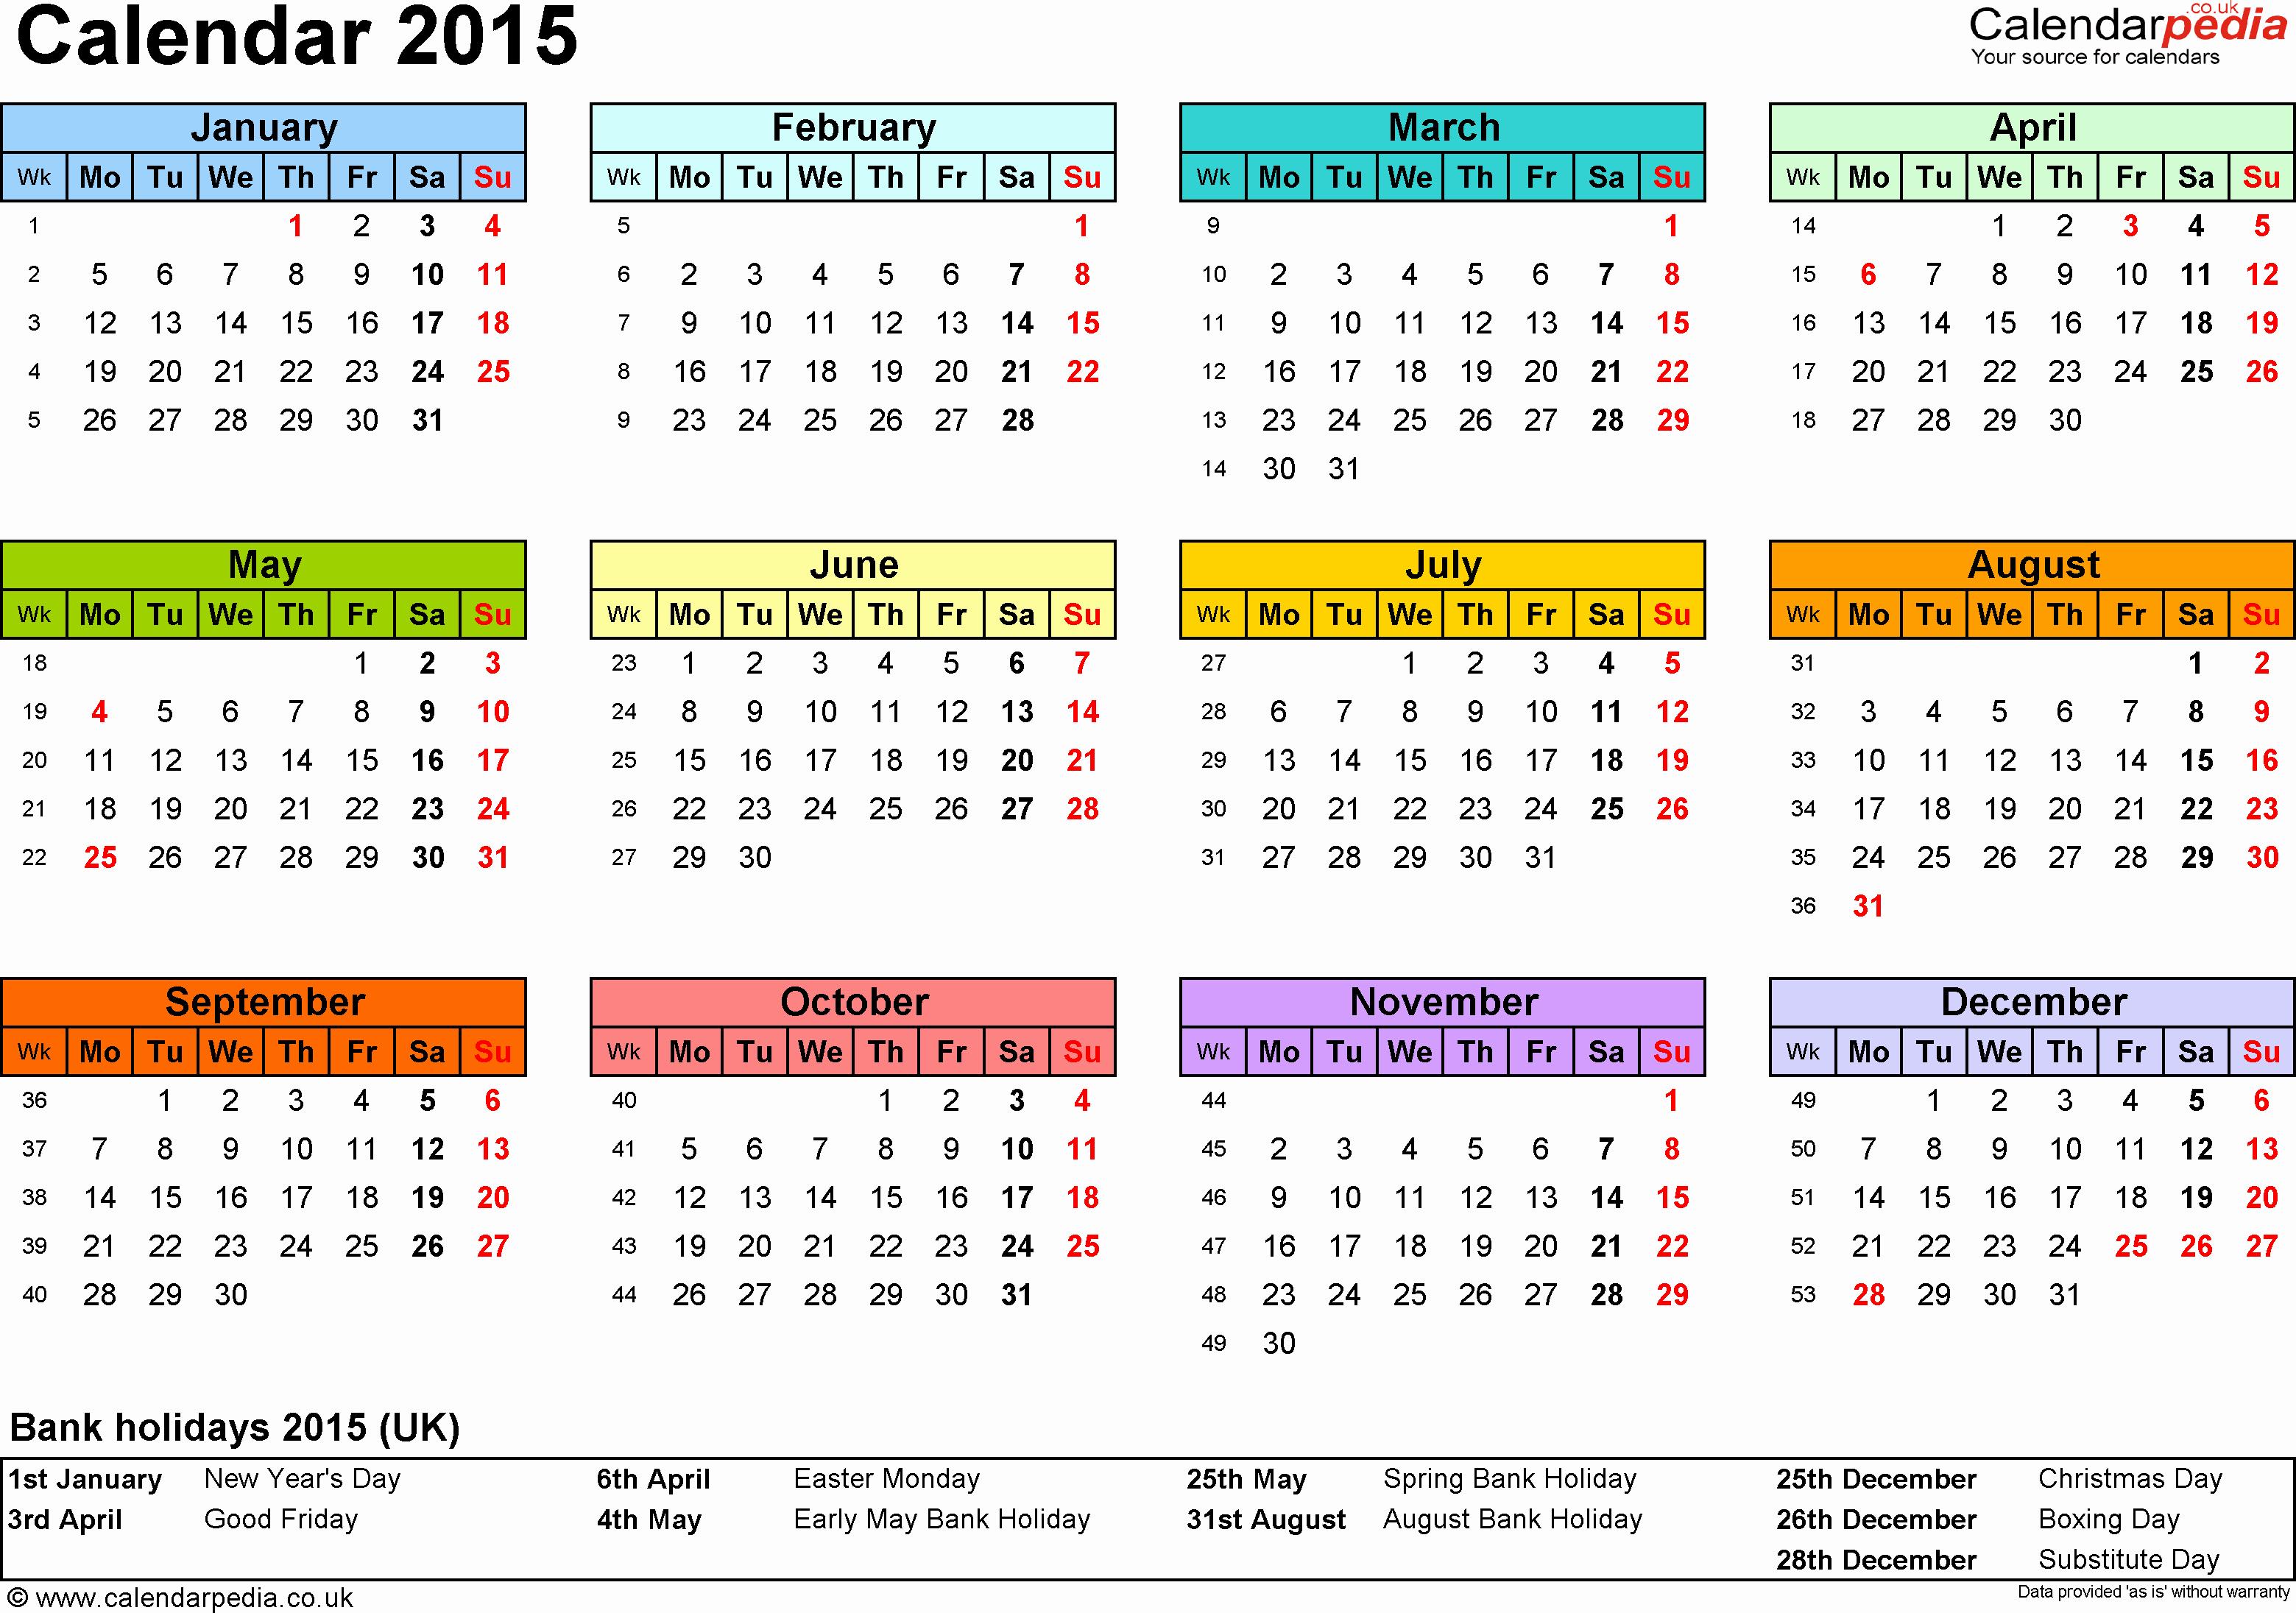 Free Editable Calendar Template 2015 Inspirational Calendar 2015 Editable – 2017 Printable Calendar